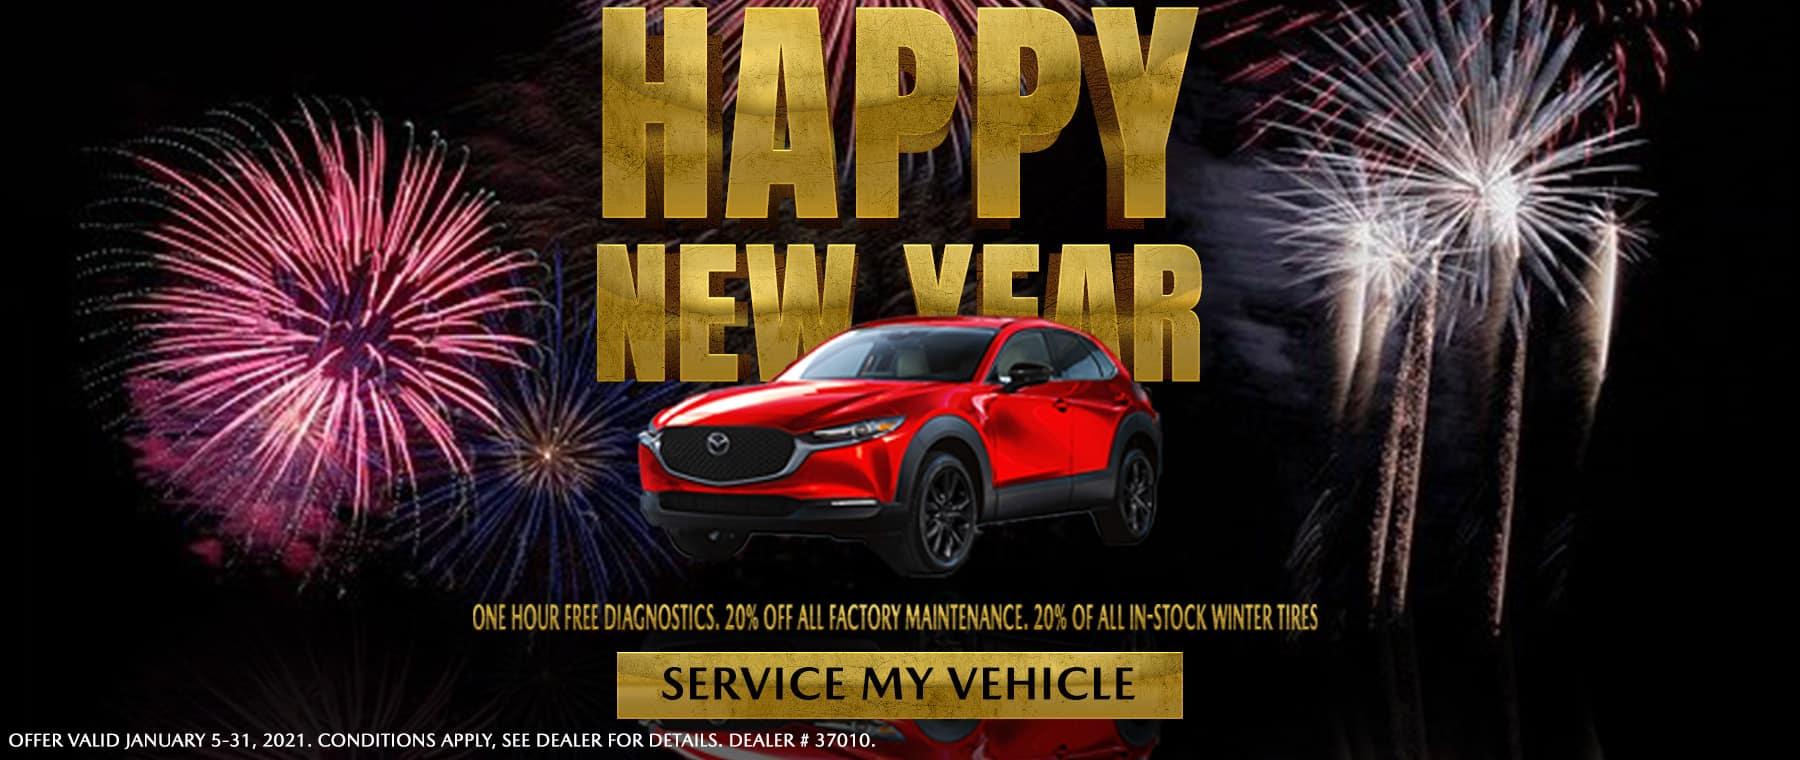 1 hour free diagnostics – 20% off factory maintenace – 20% off winter tires – Harris Mazda Banner